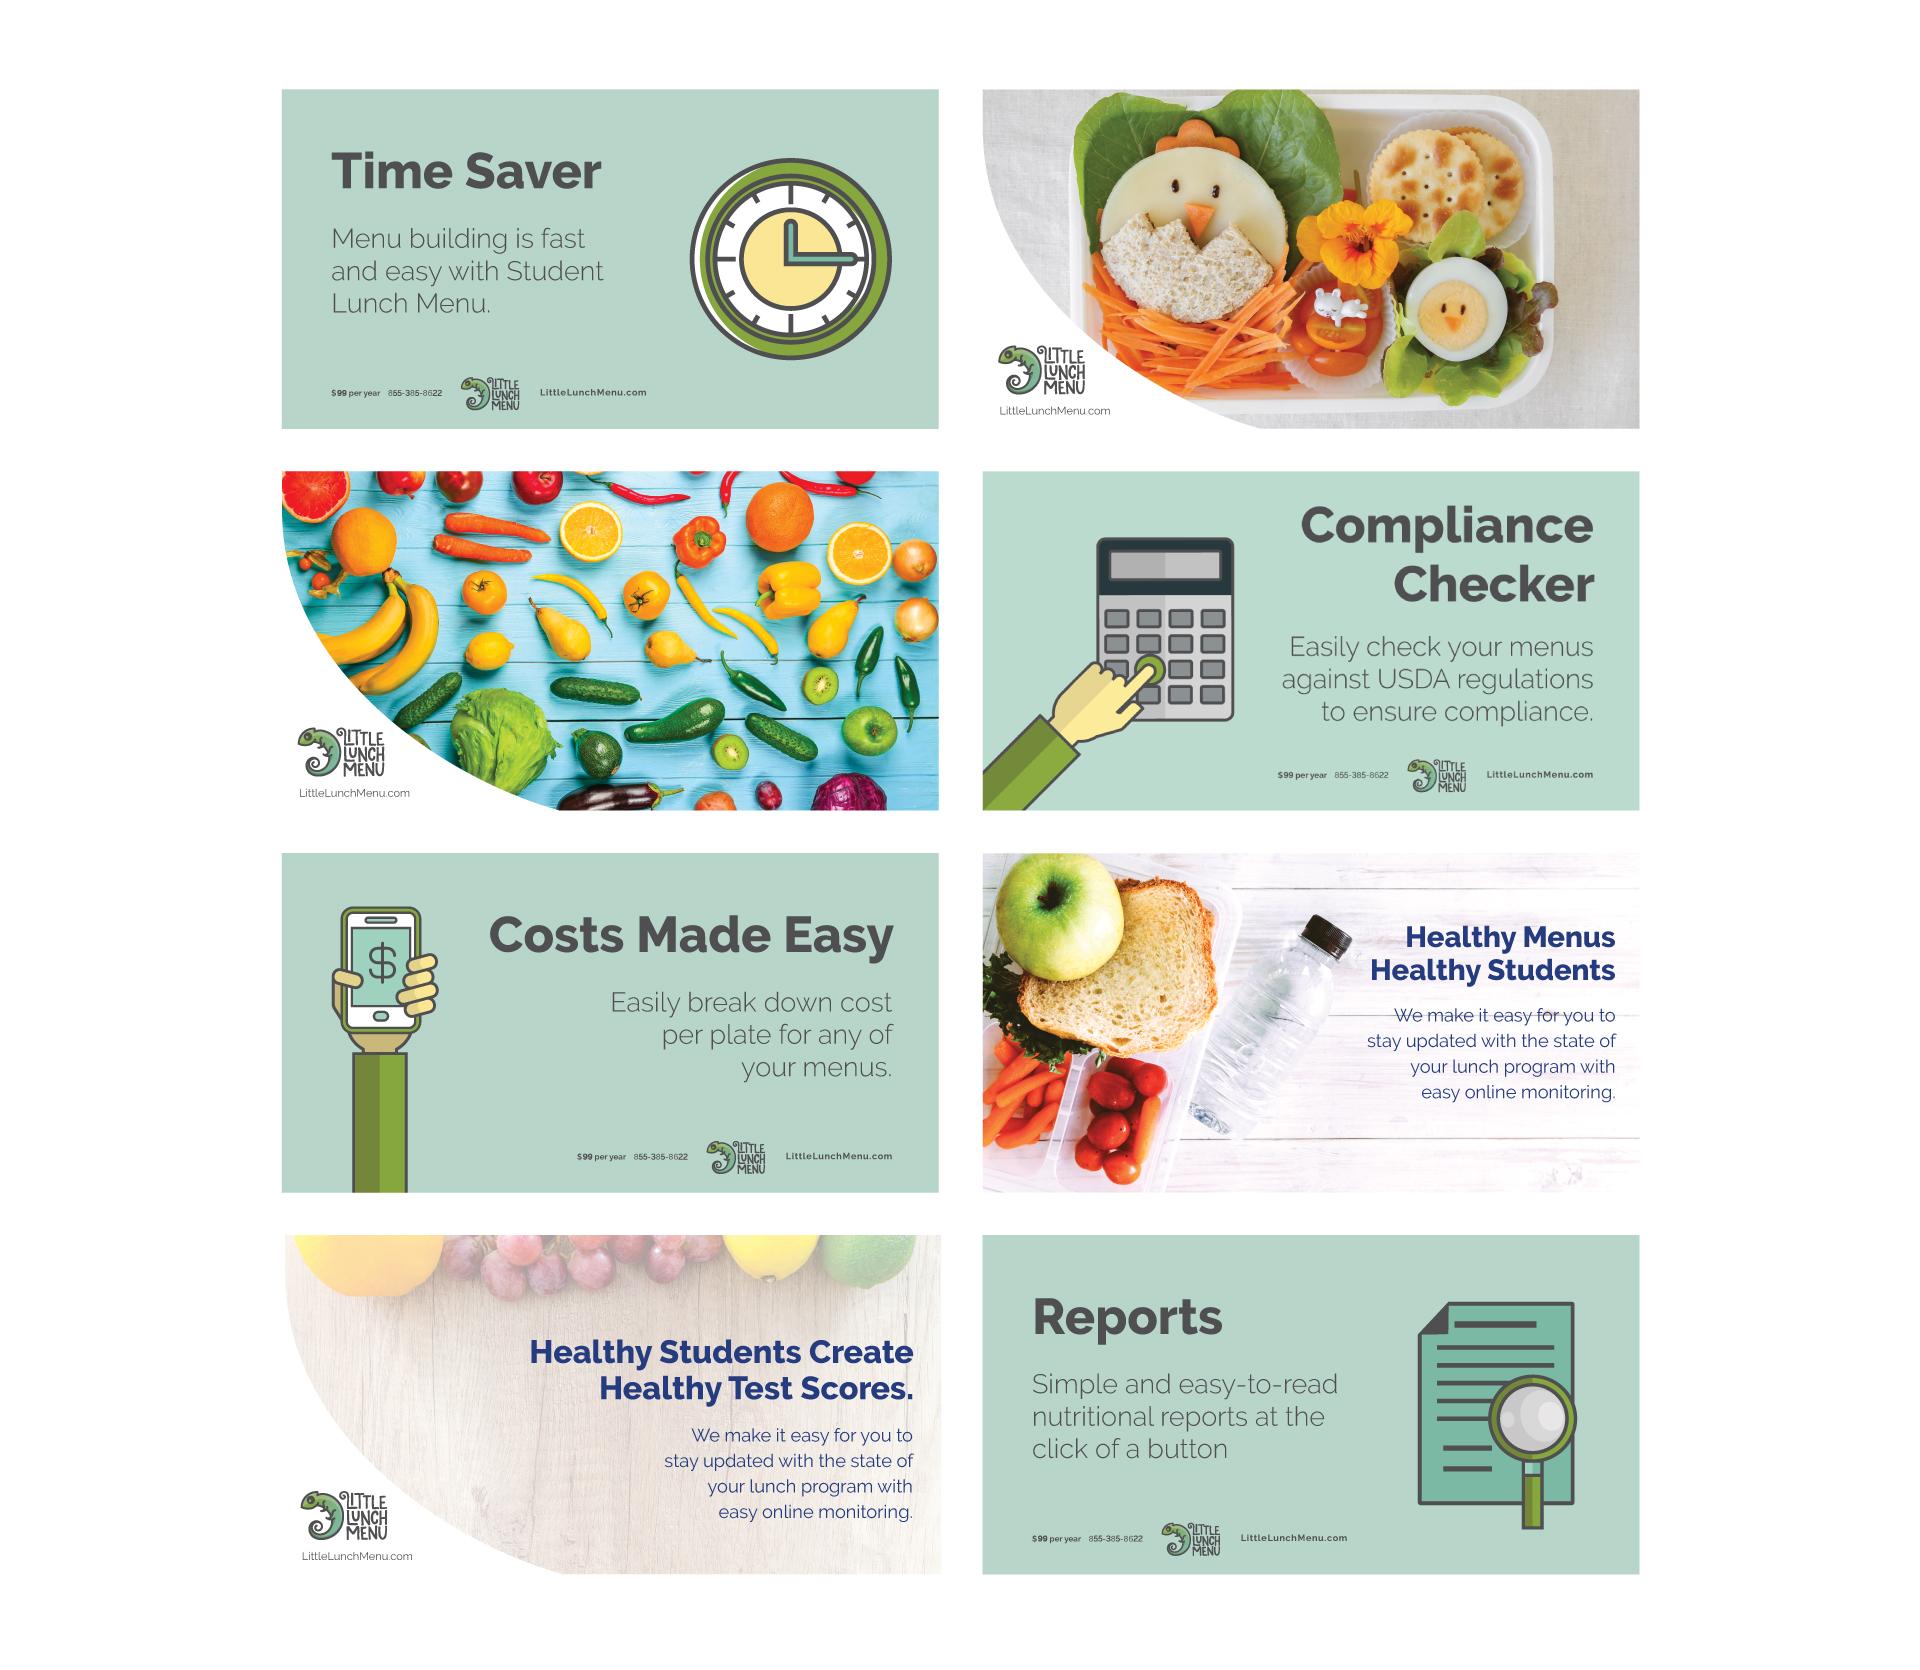 Little Lunch Menu Social Media Advertisements by Agency 877